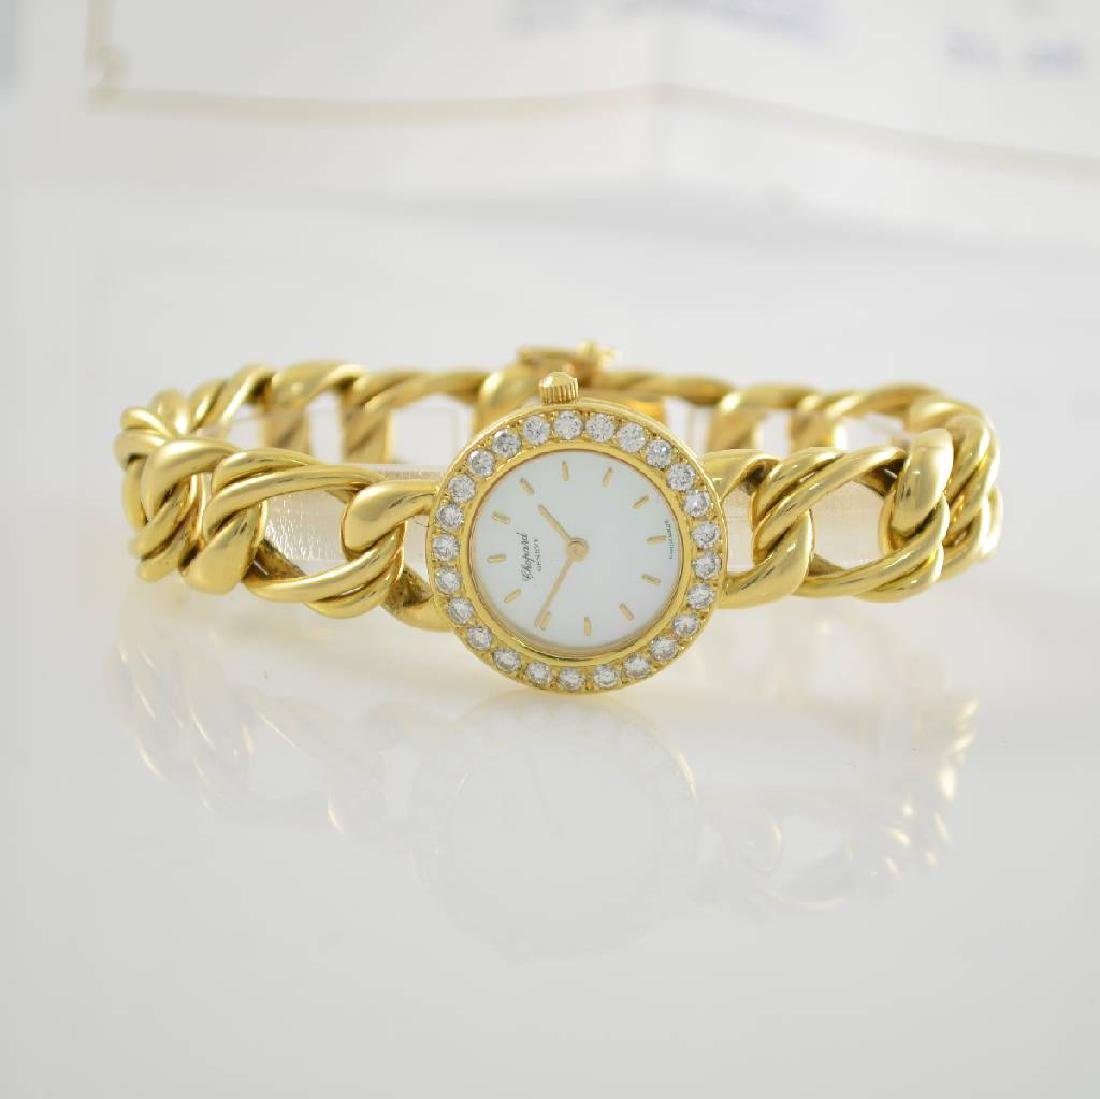 CHOPARD unusual ladies wristwatch in 18k yellow gold